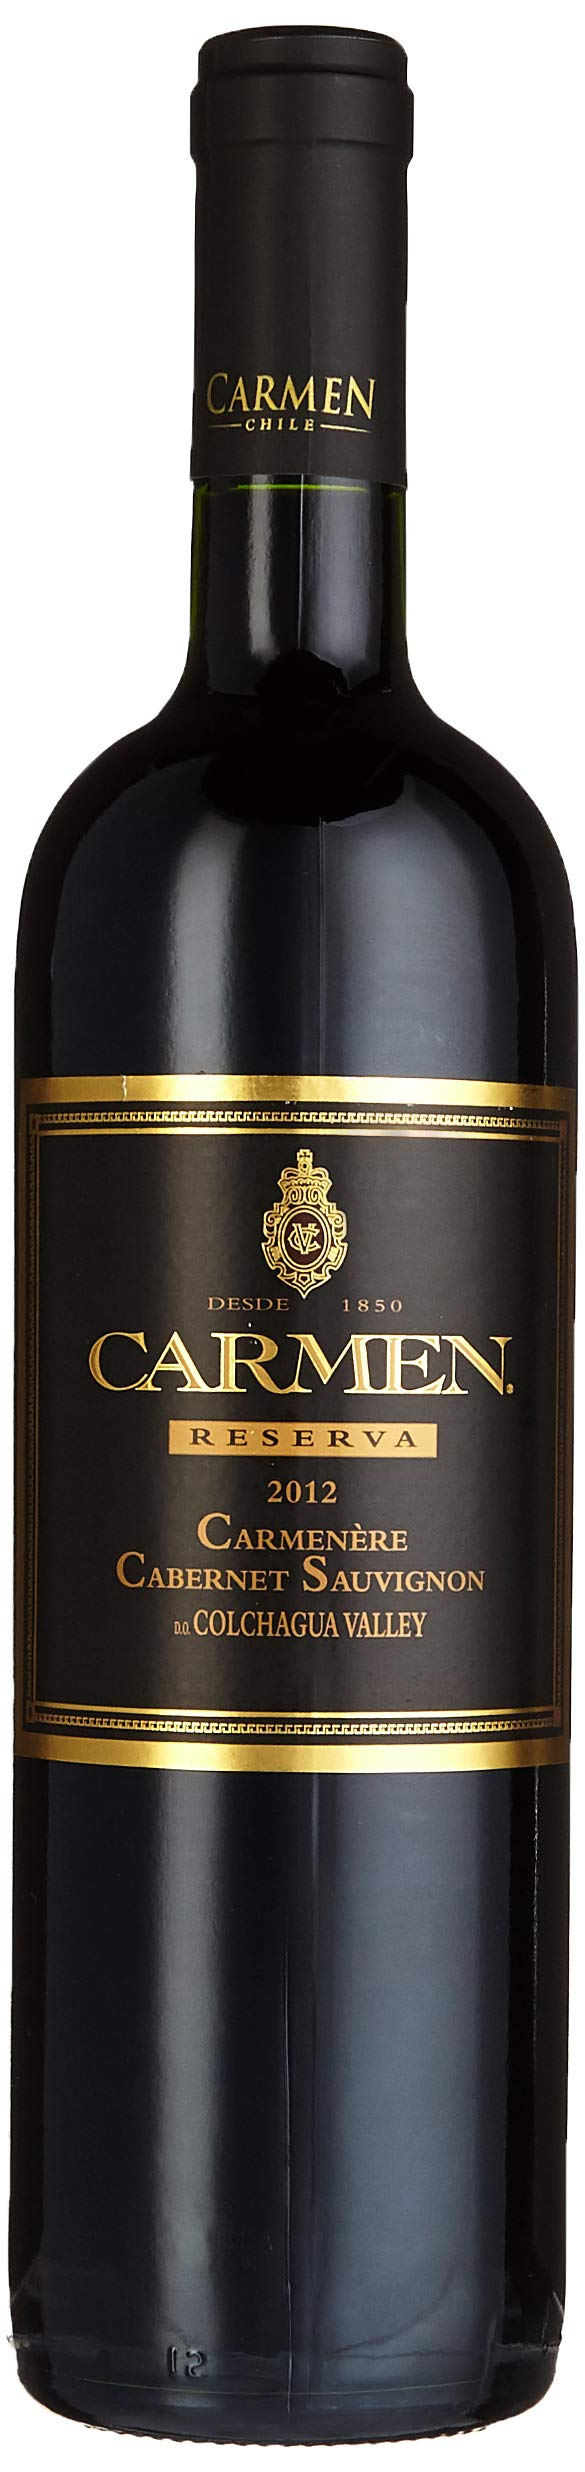 Via-Carmen-Reservado-Carmenere-2012-Trocken-3-x-075-l